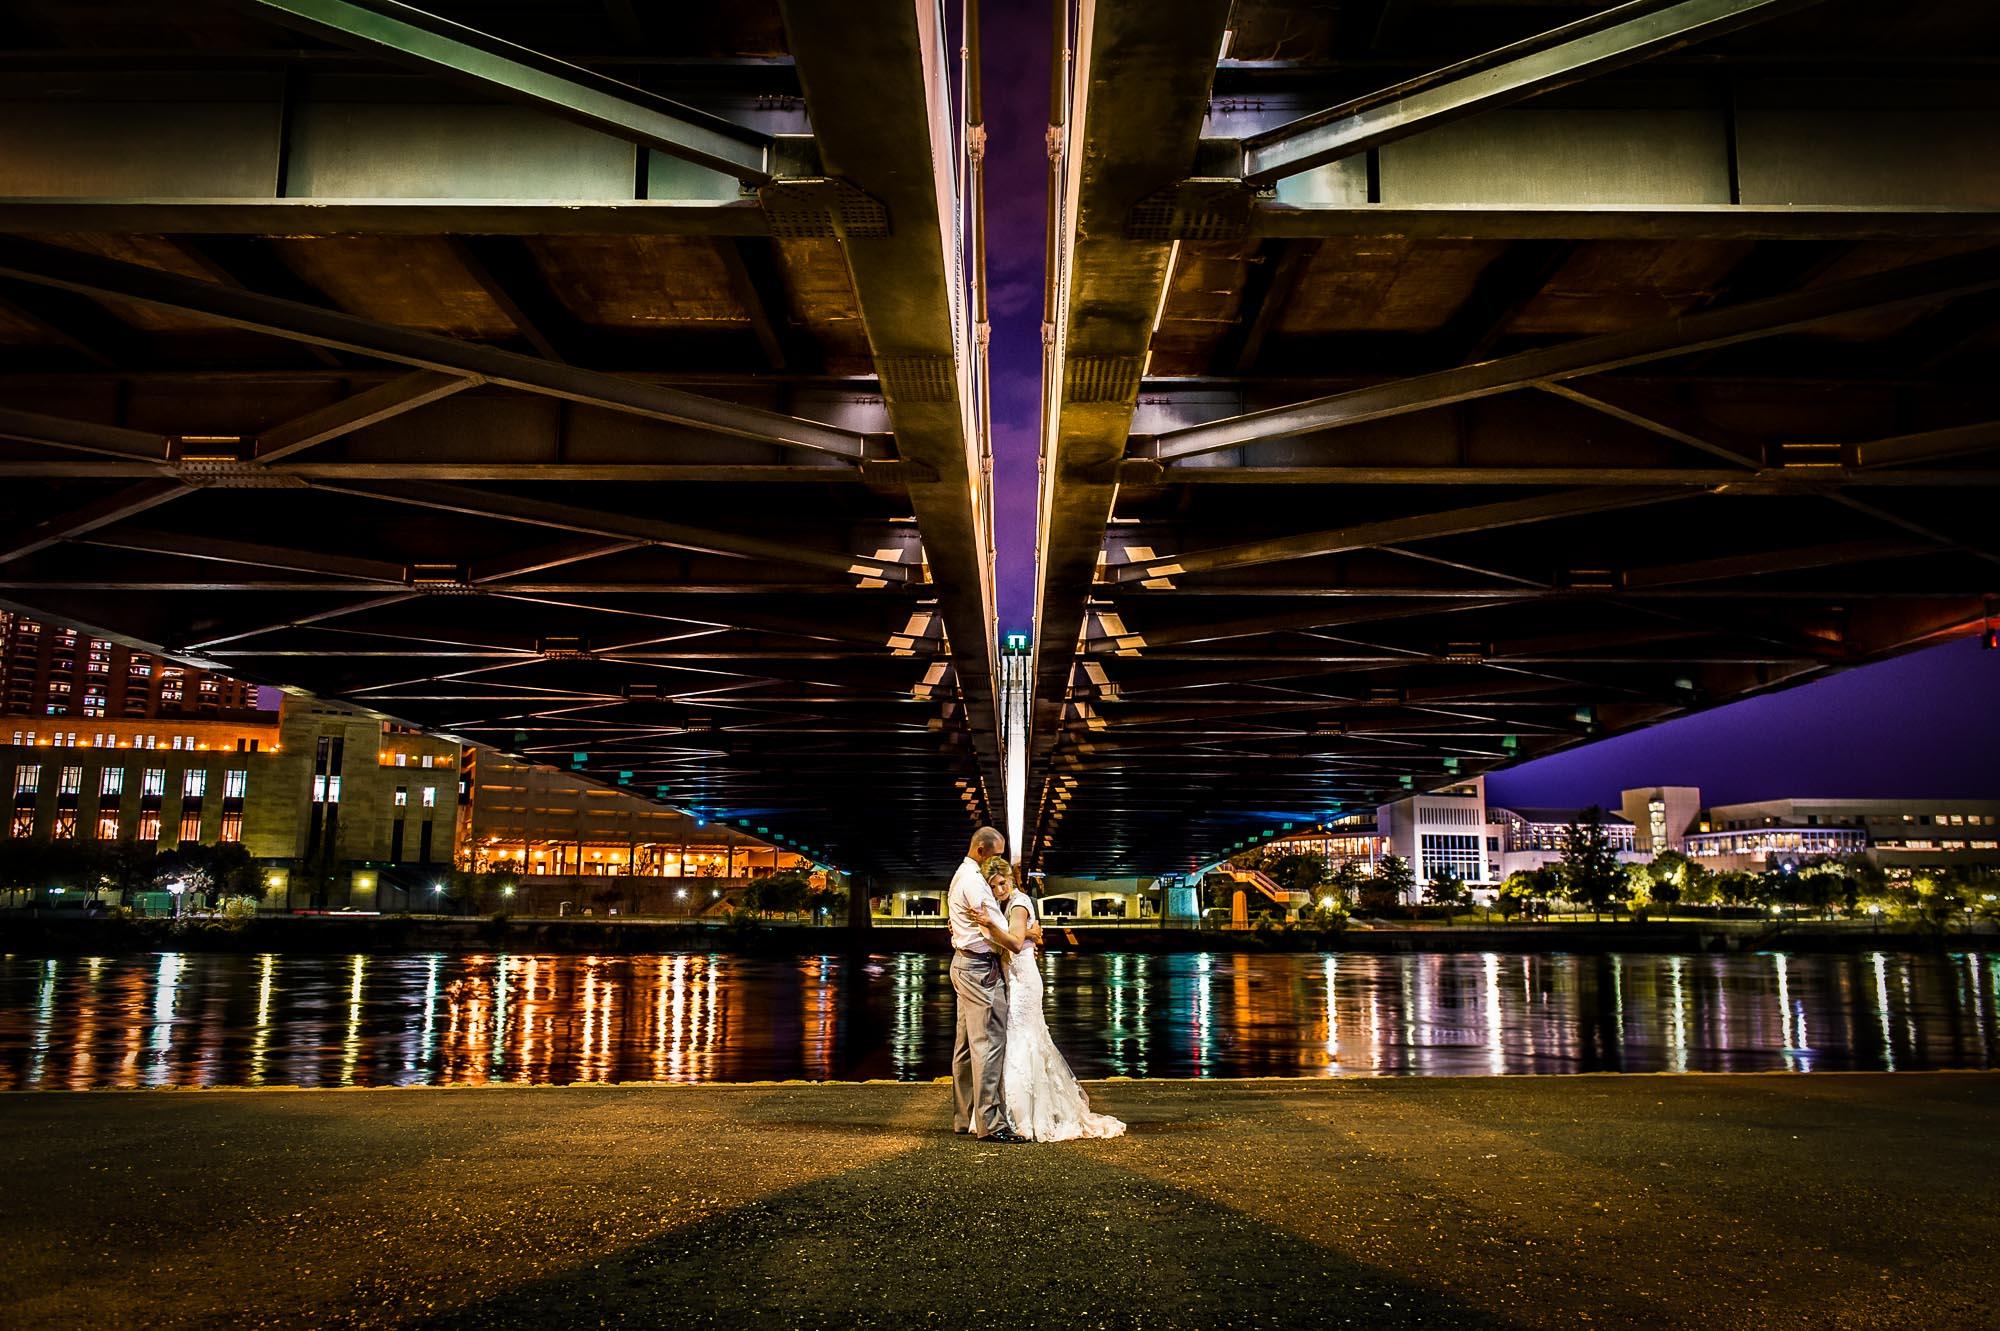 Nighttime wedding photo in Minneapolis underneath the Hennepin Bridge